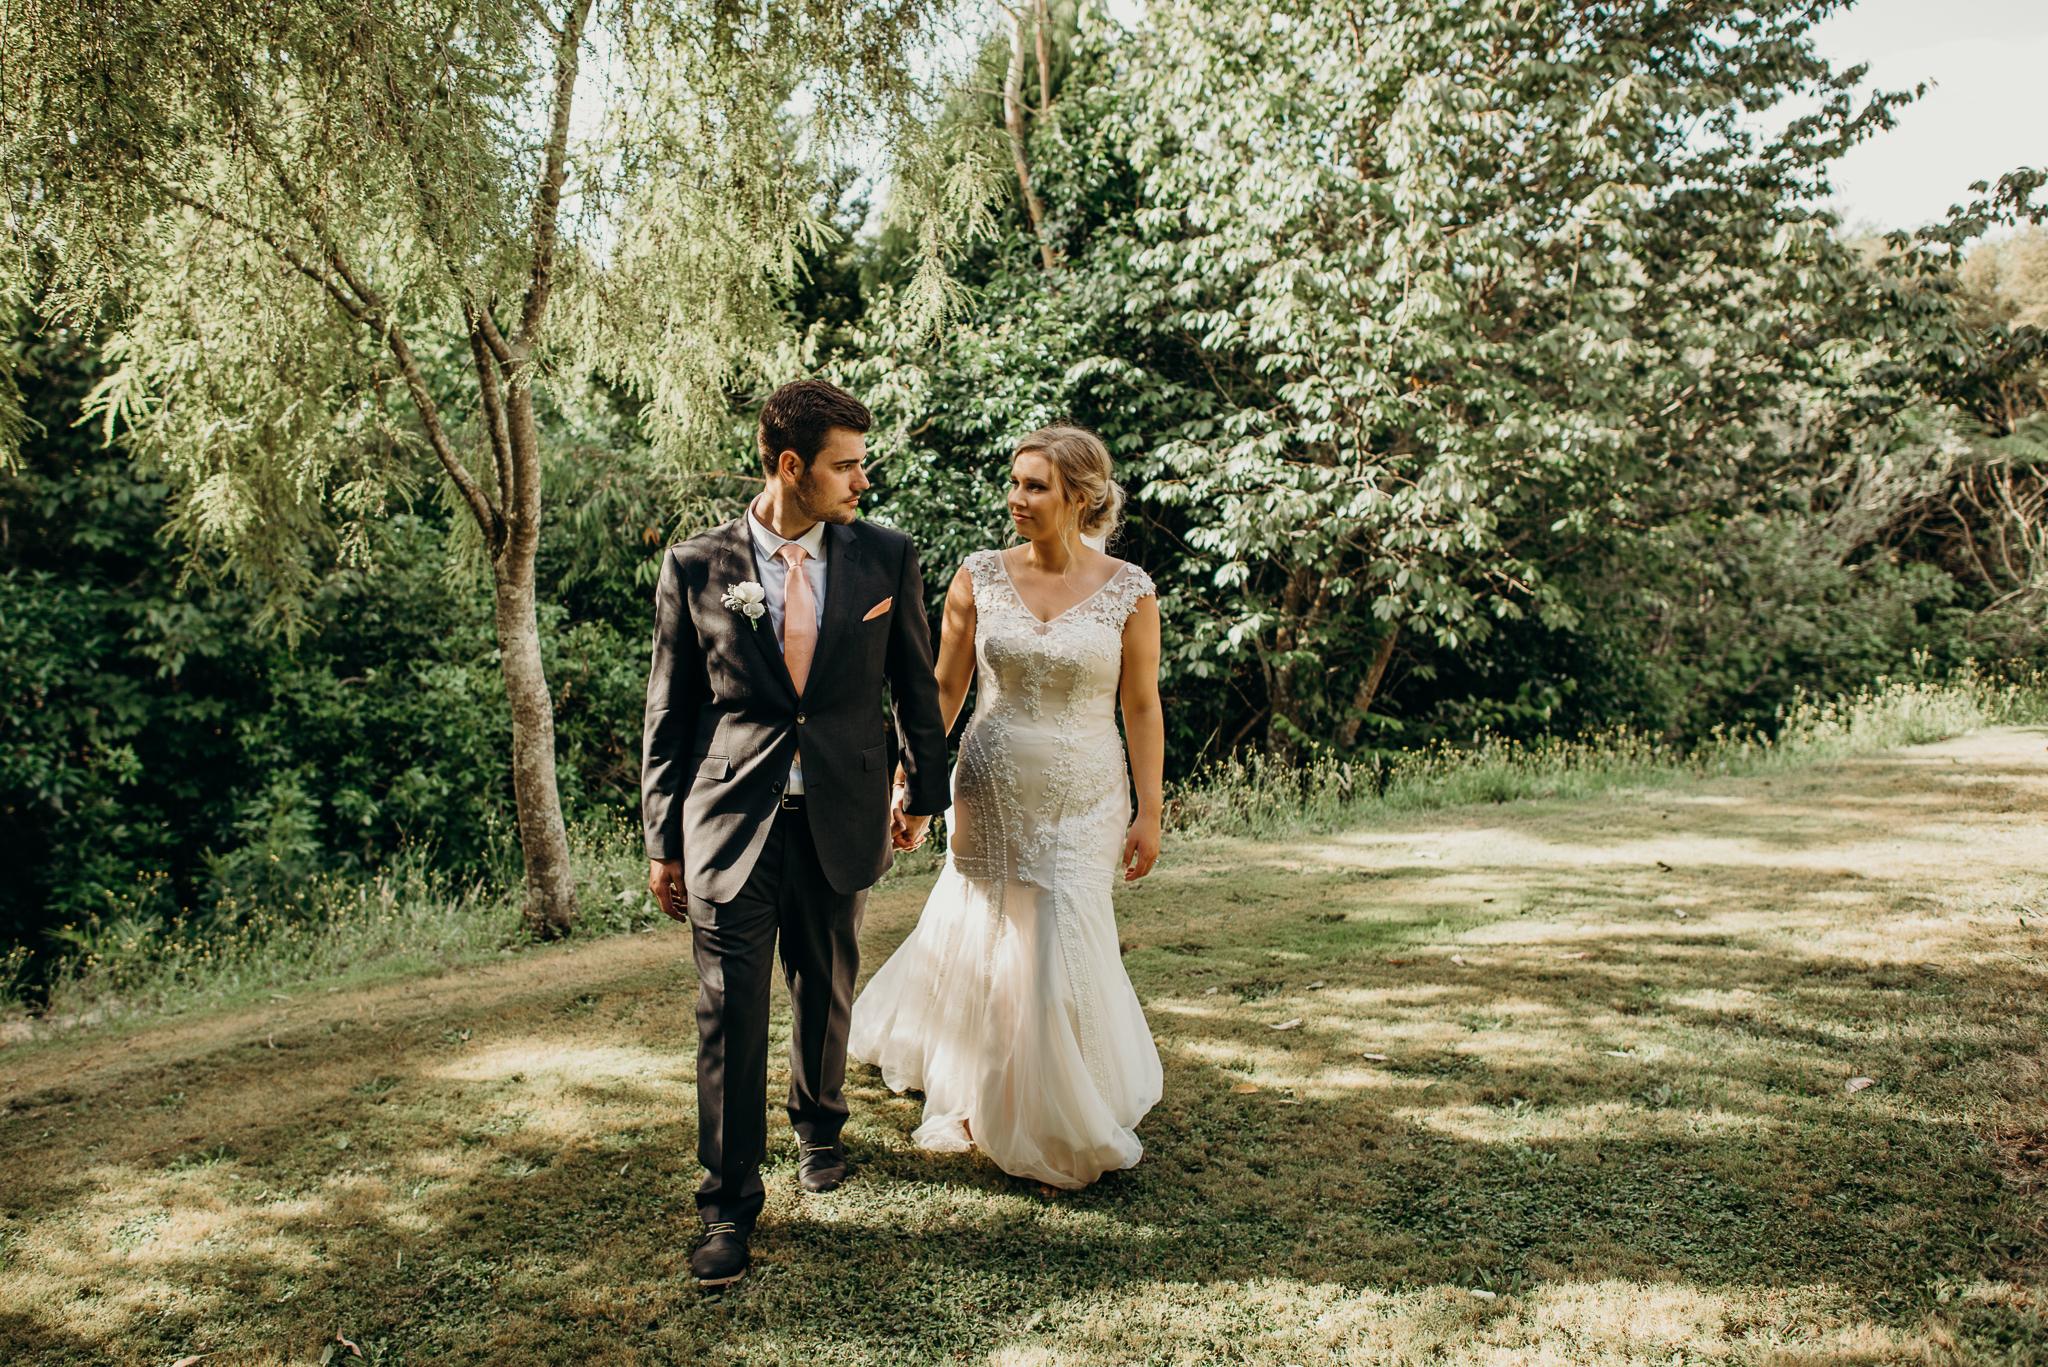 Tauranga-Coromandel-Elegant-Wedding-Photographer-Charlemagne-Lodge-97.jpg